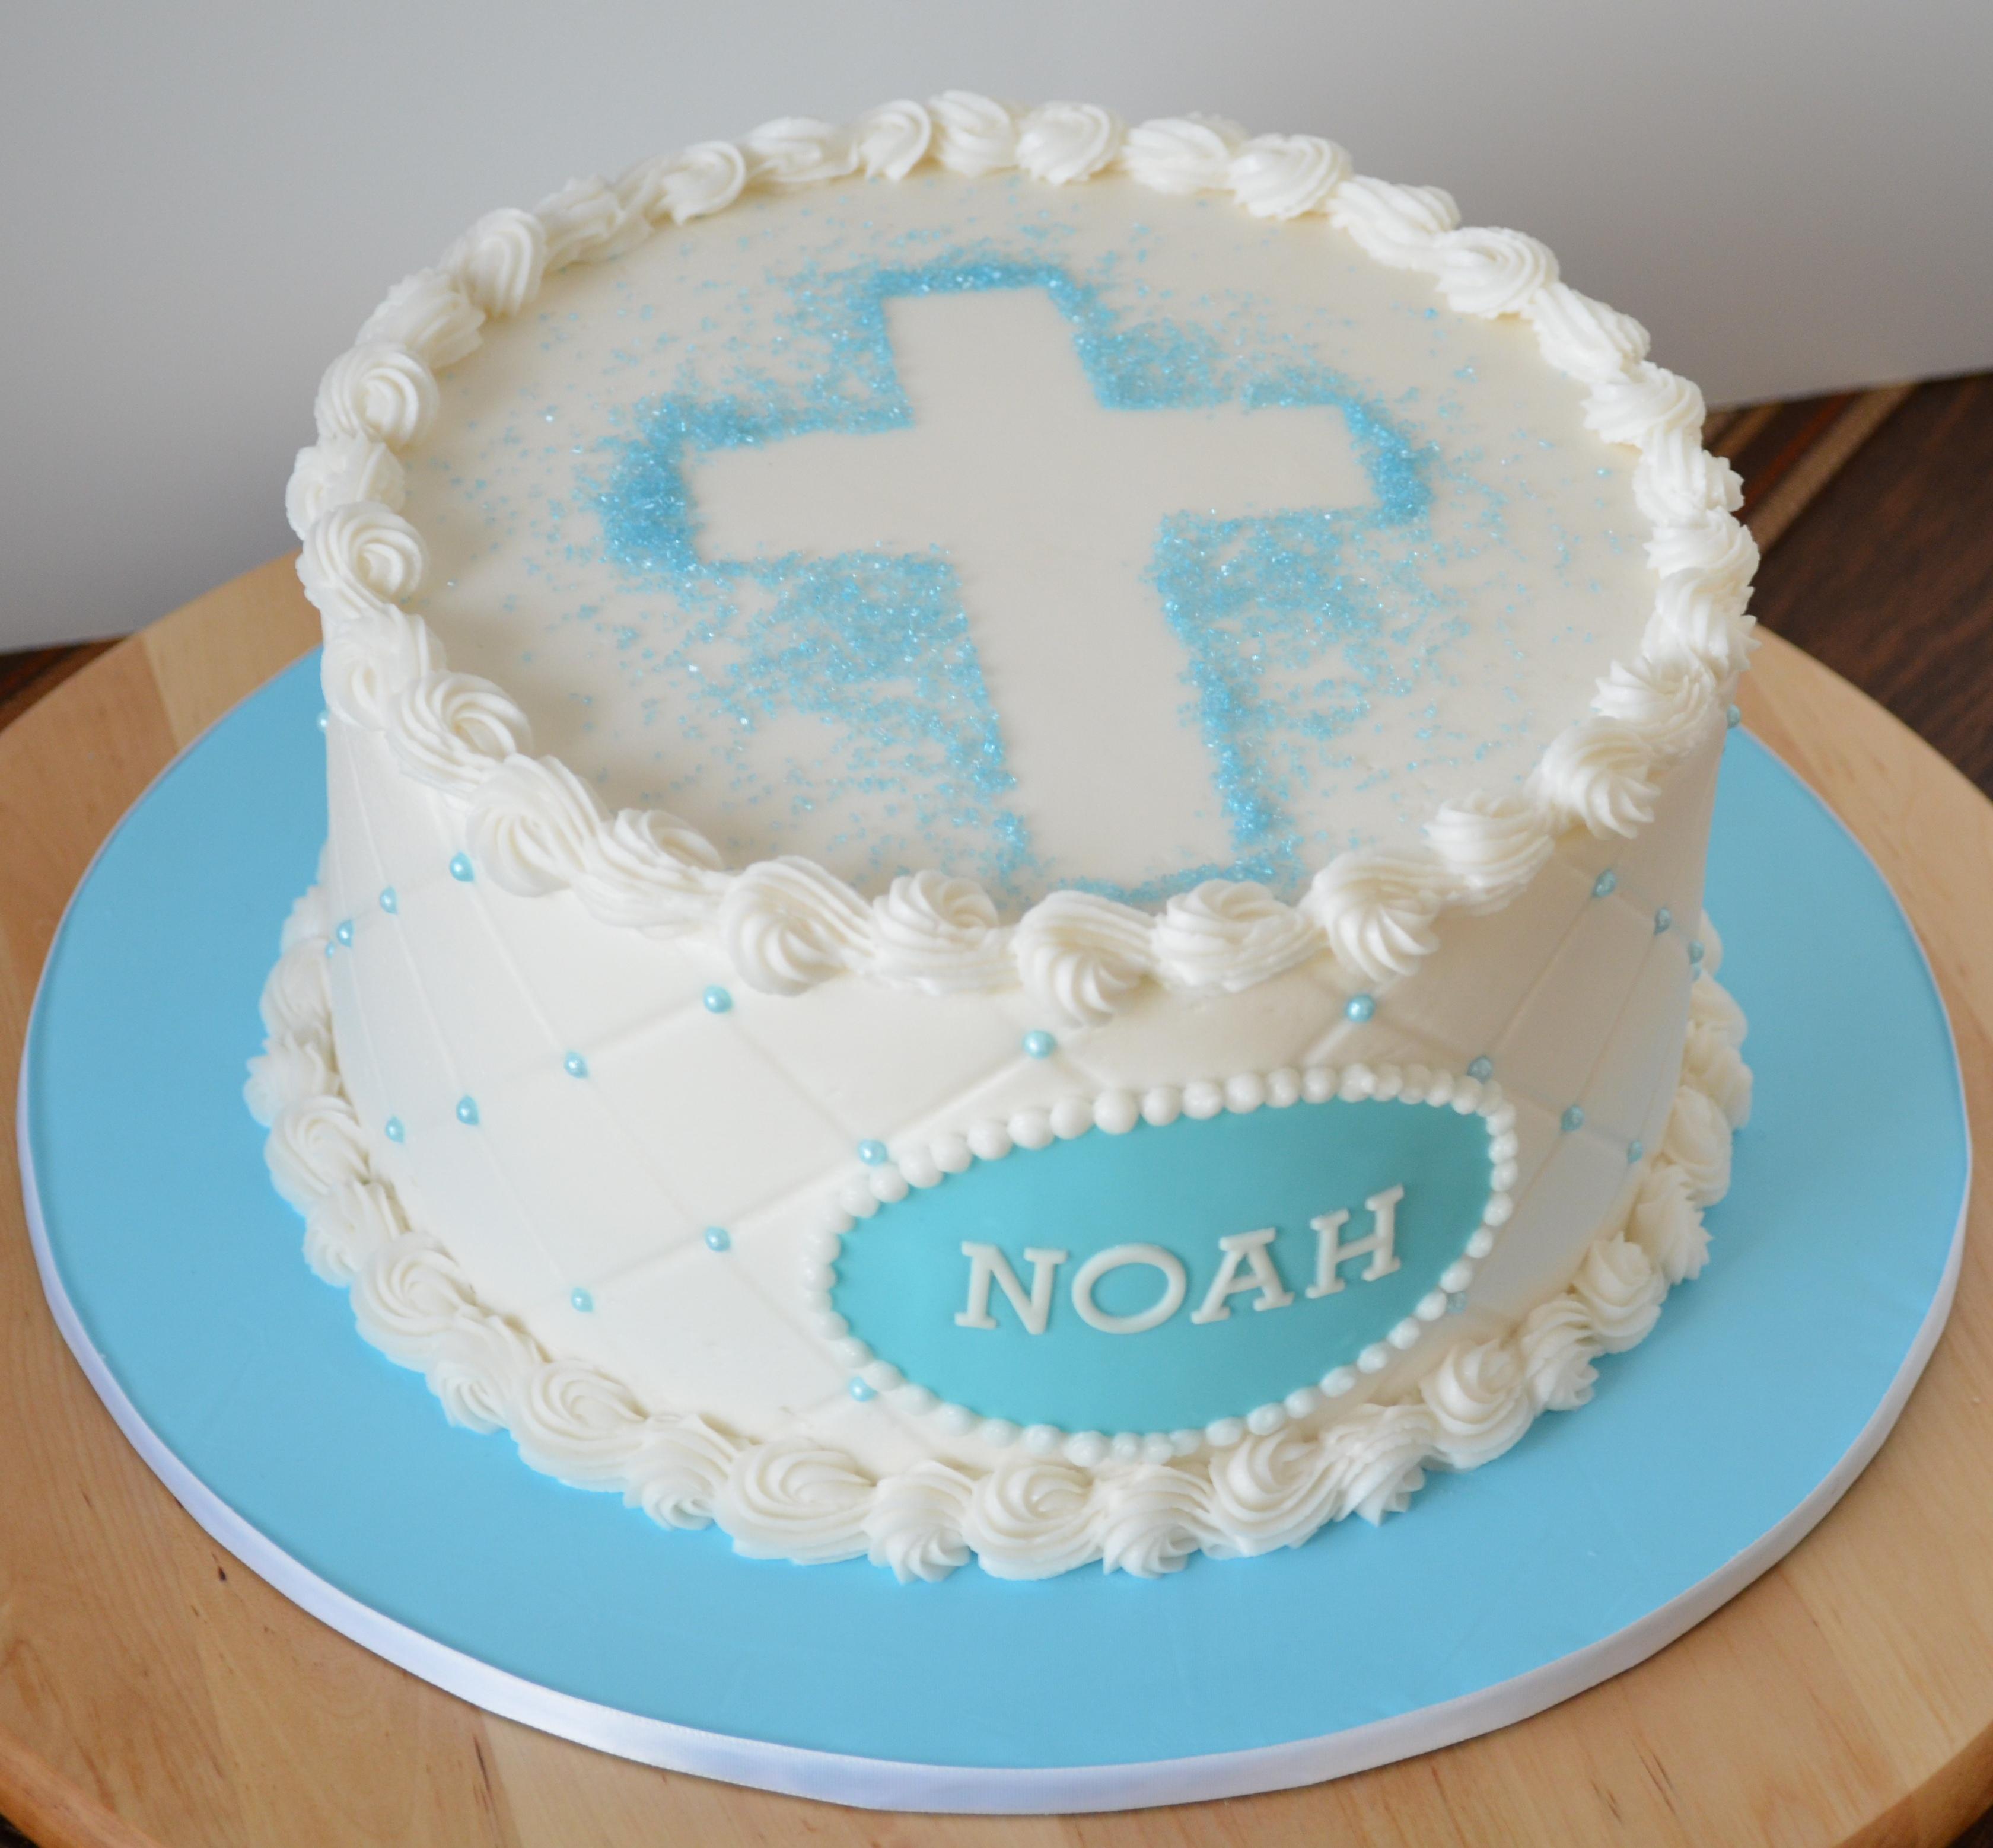 10 baby dedication cakes for boys photo baby dedication cake boys